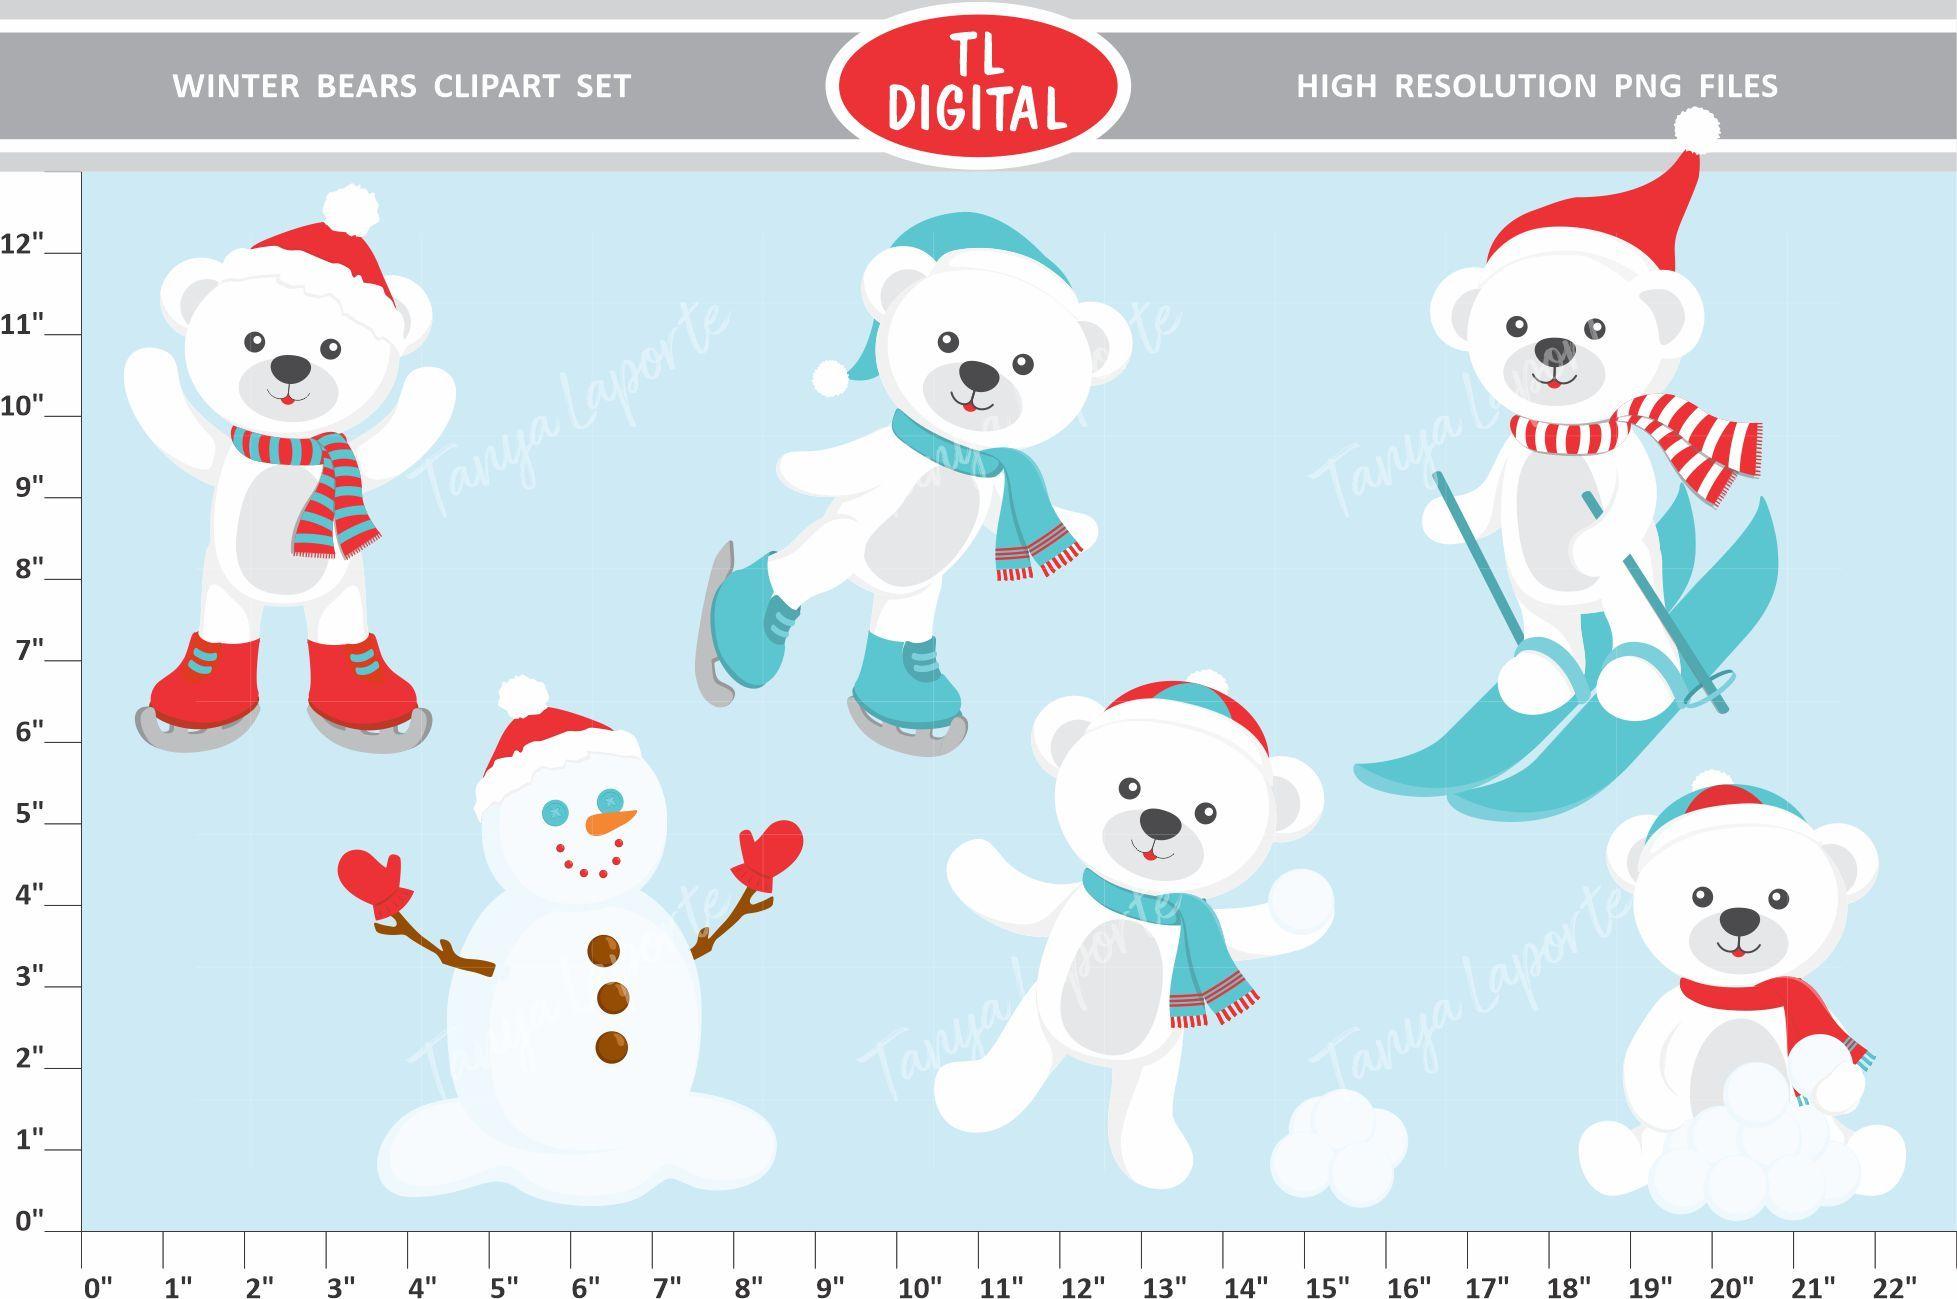 Winter Bear Clipart Set Graphic By Tl Digital Creative Fabrica Bear Clipart Graphic Illustration Clip Art